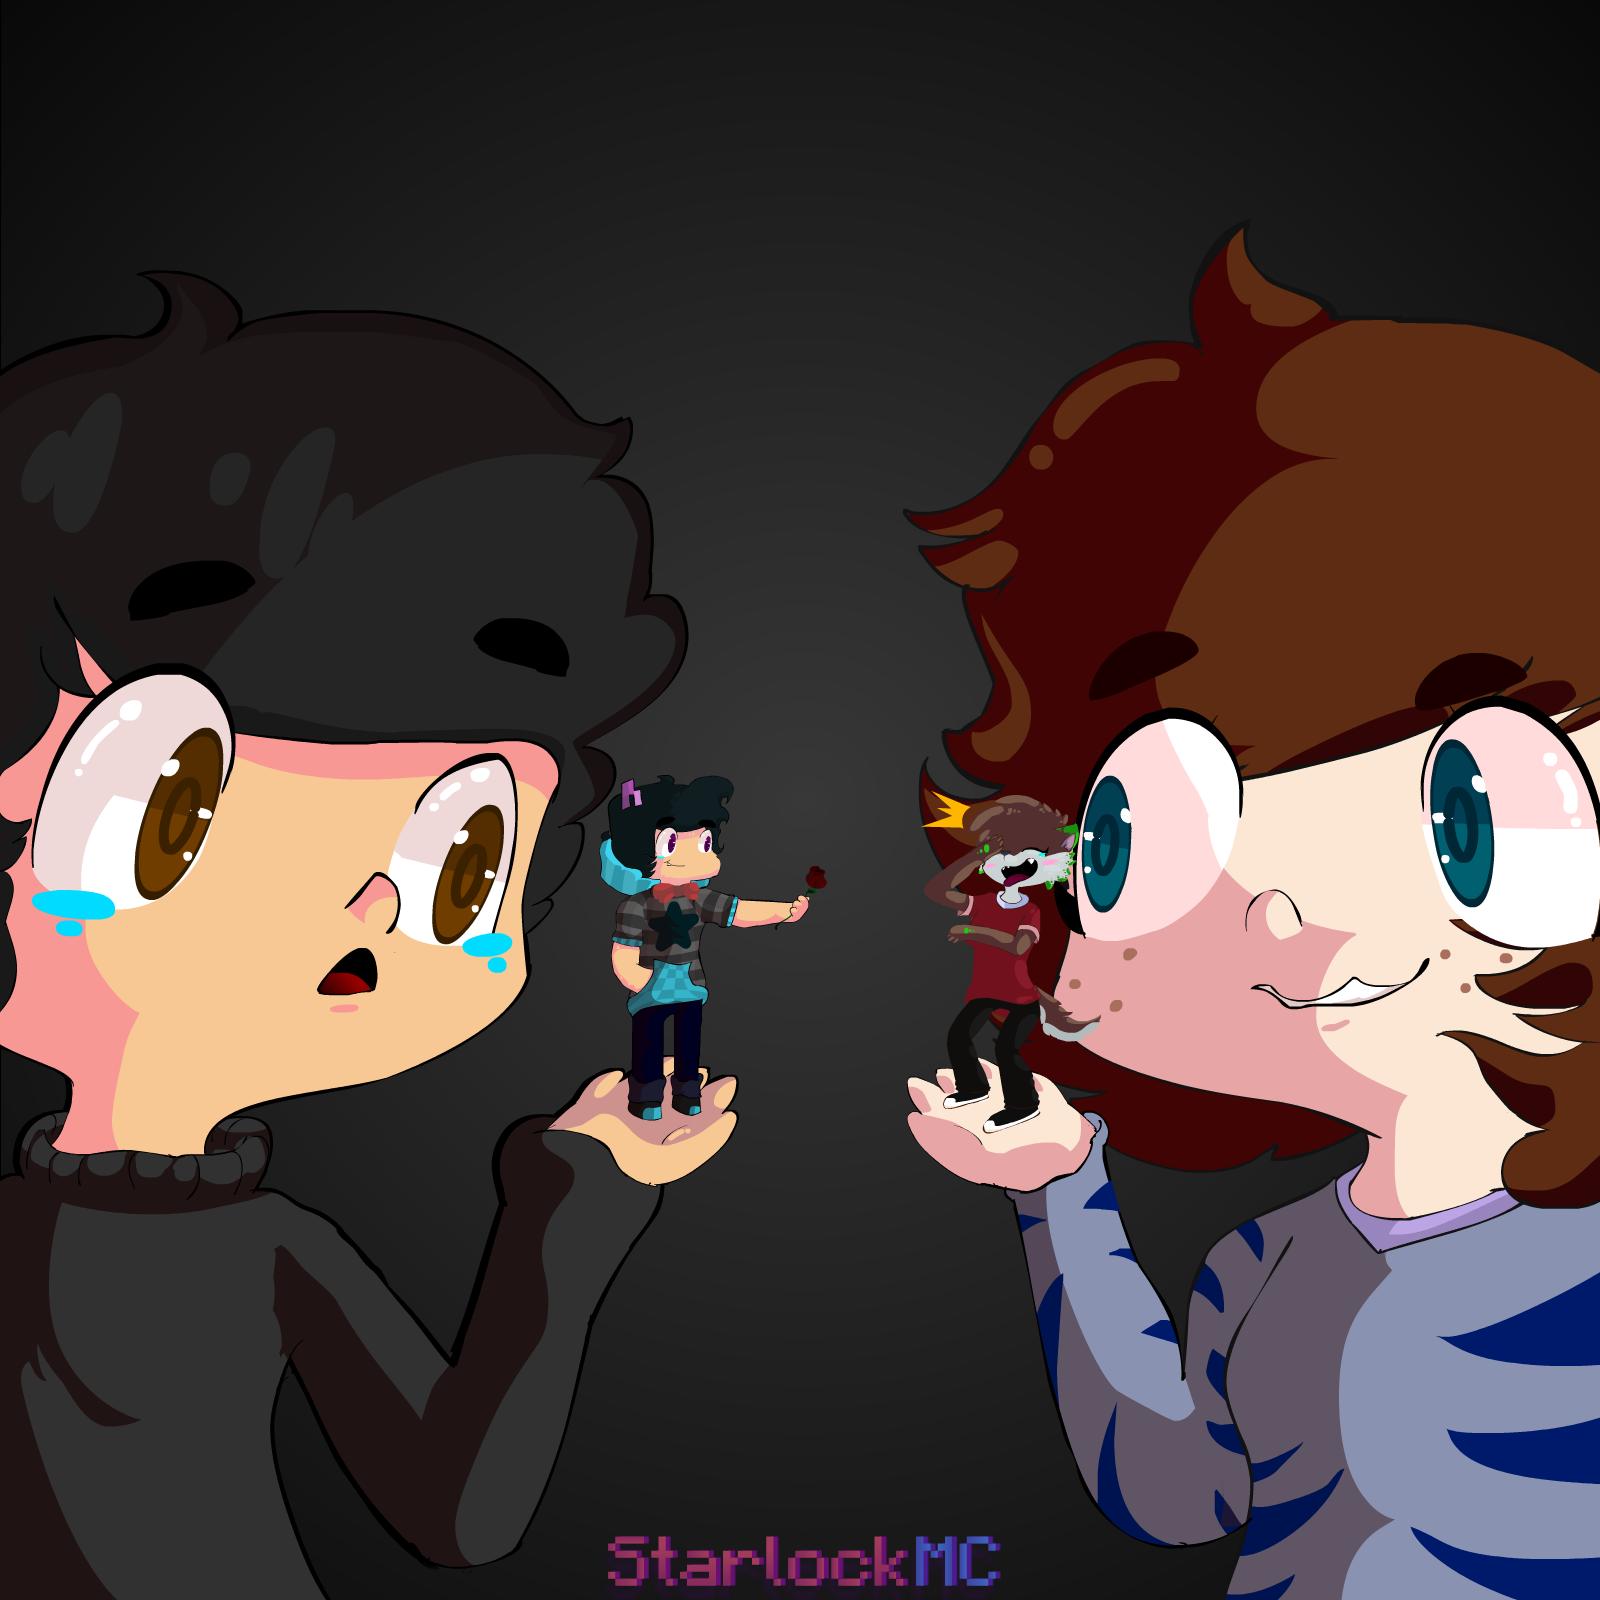 Starlock and Wolfiisaur